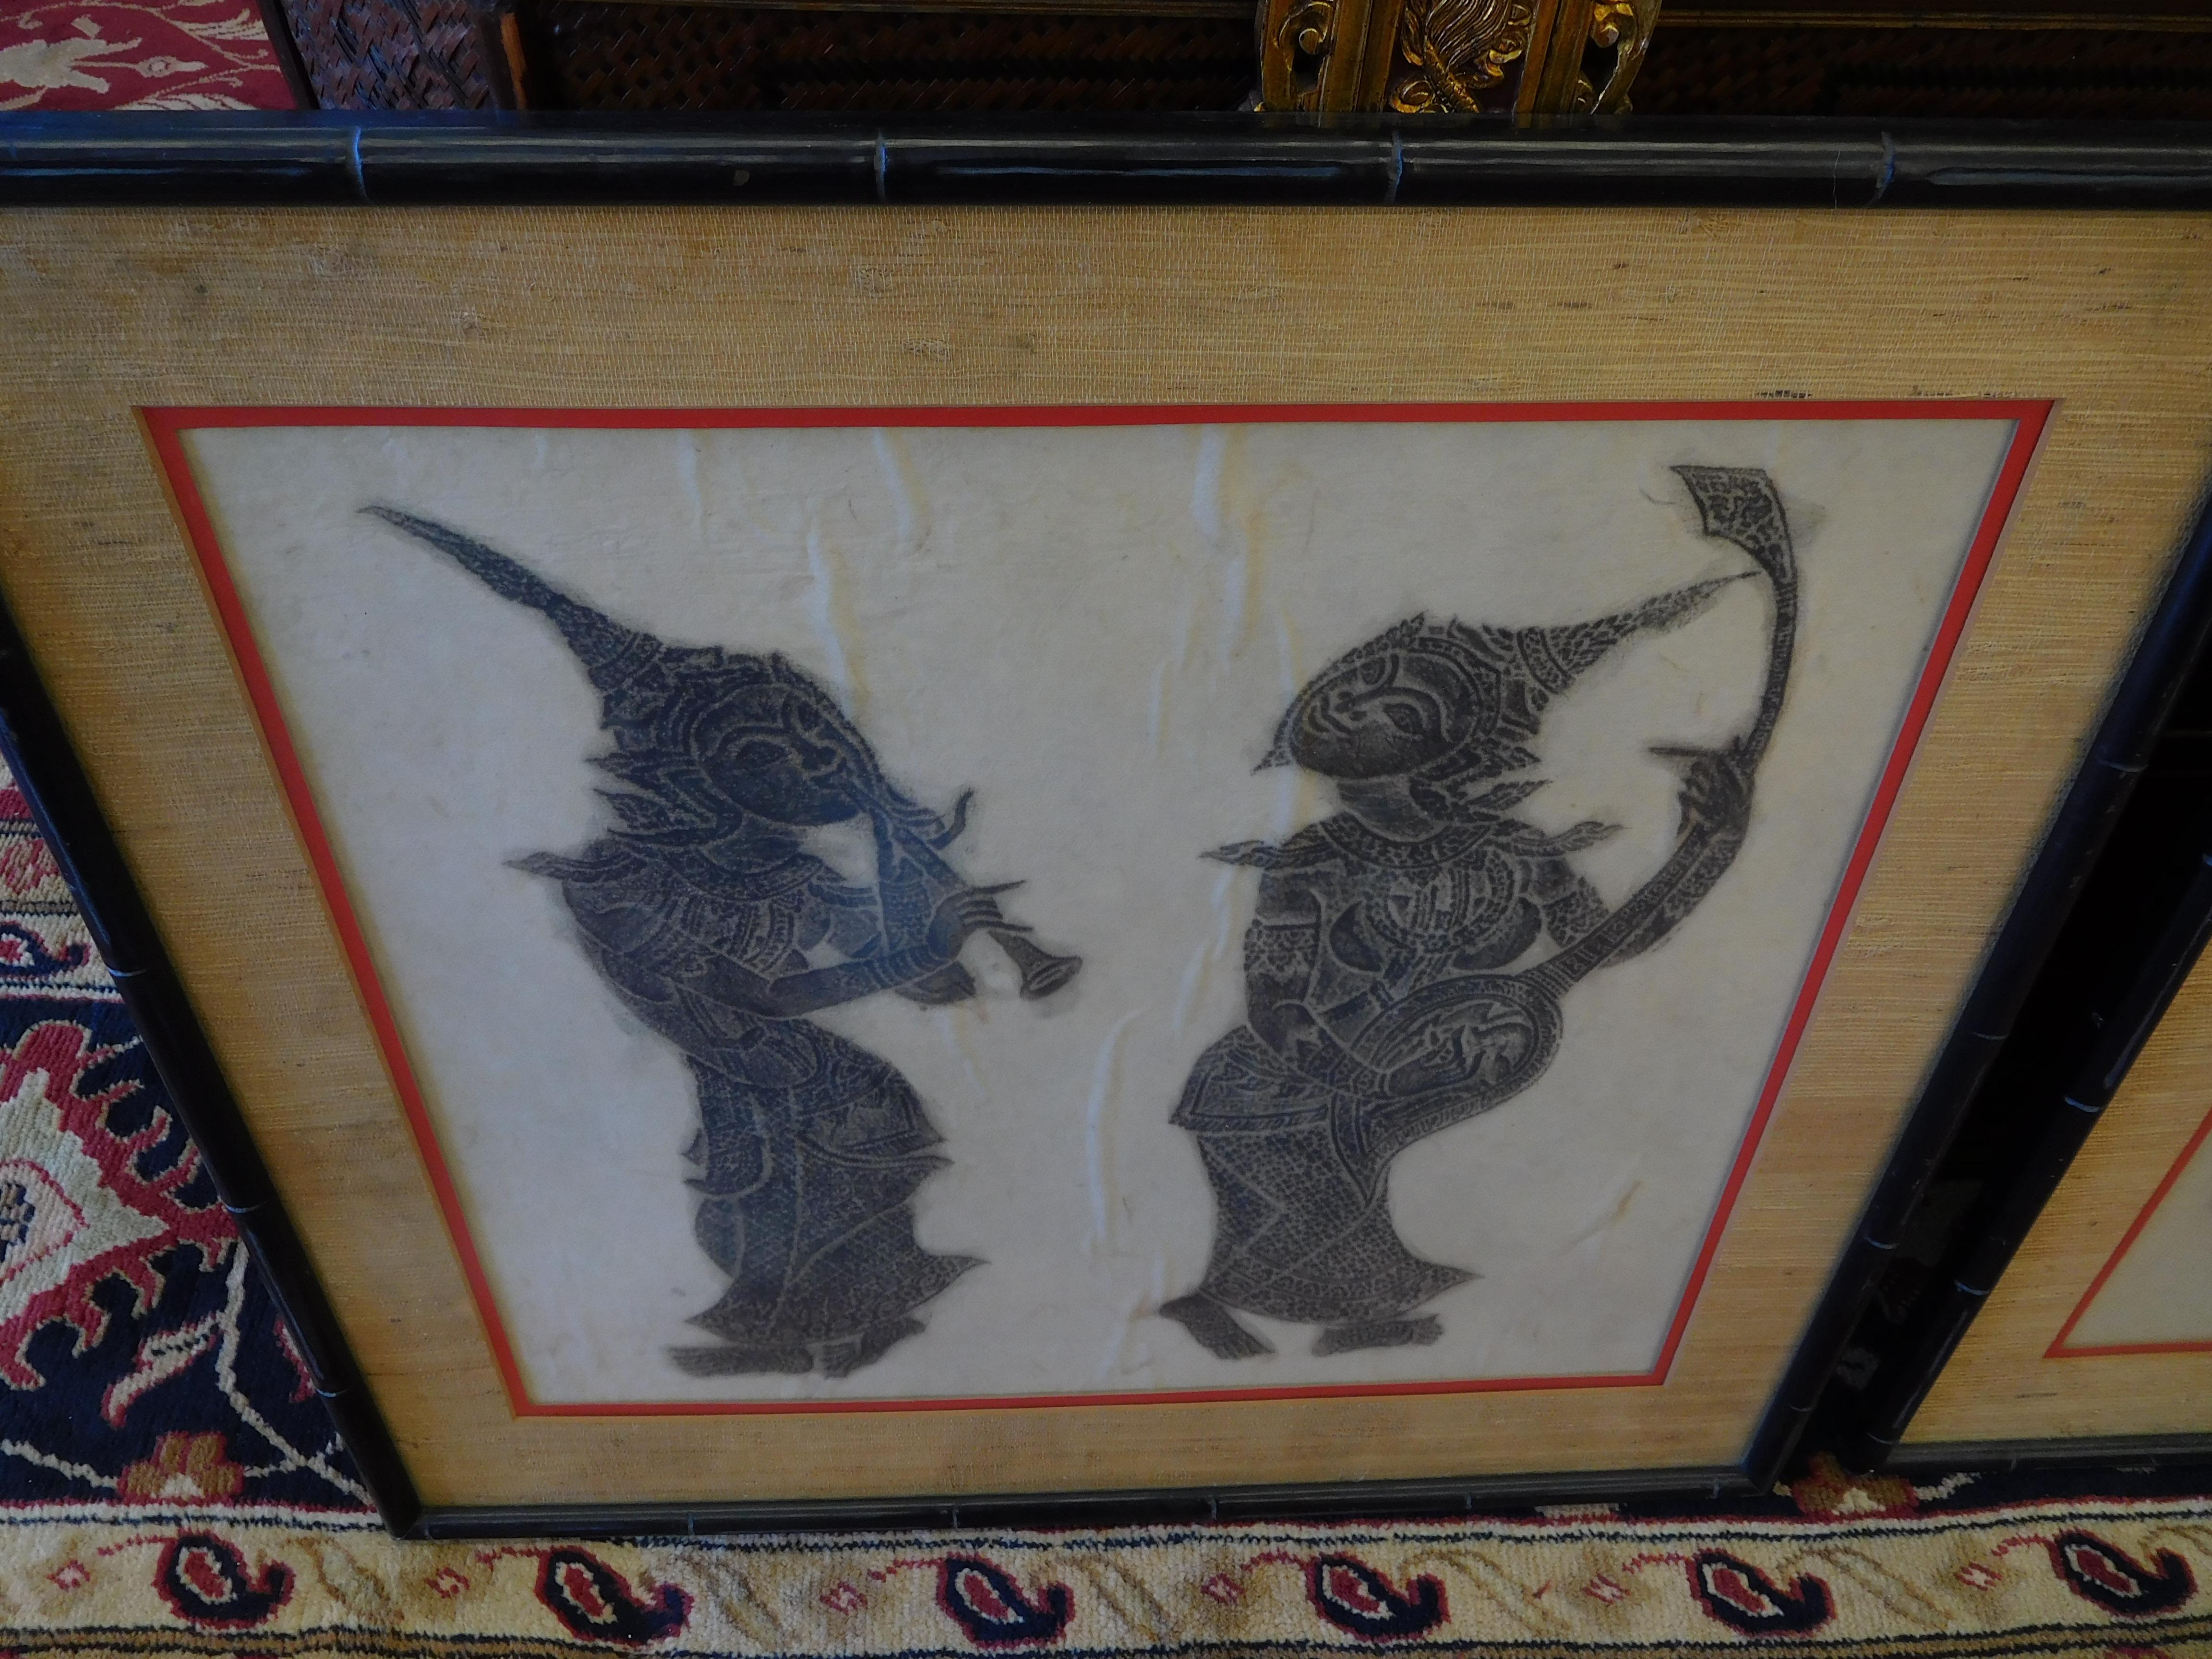 Framed Thai Artwork - 2 Musicians, Horn and Stringed Instrument